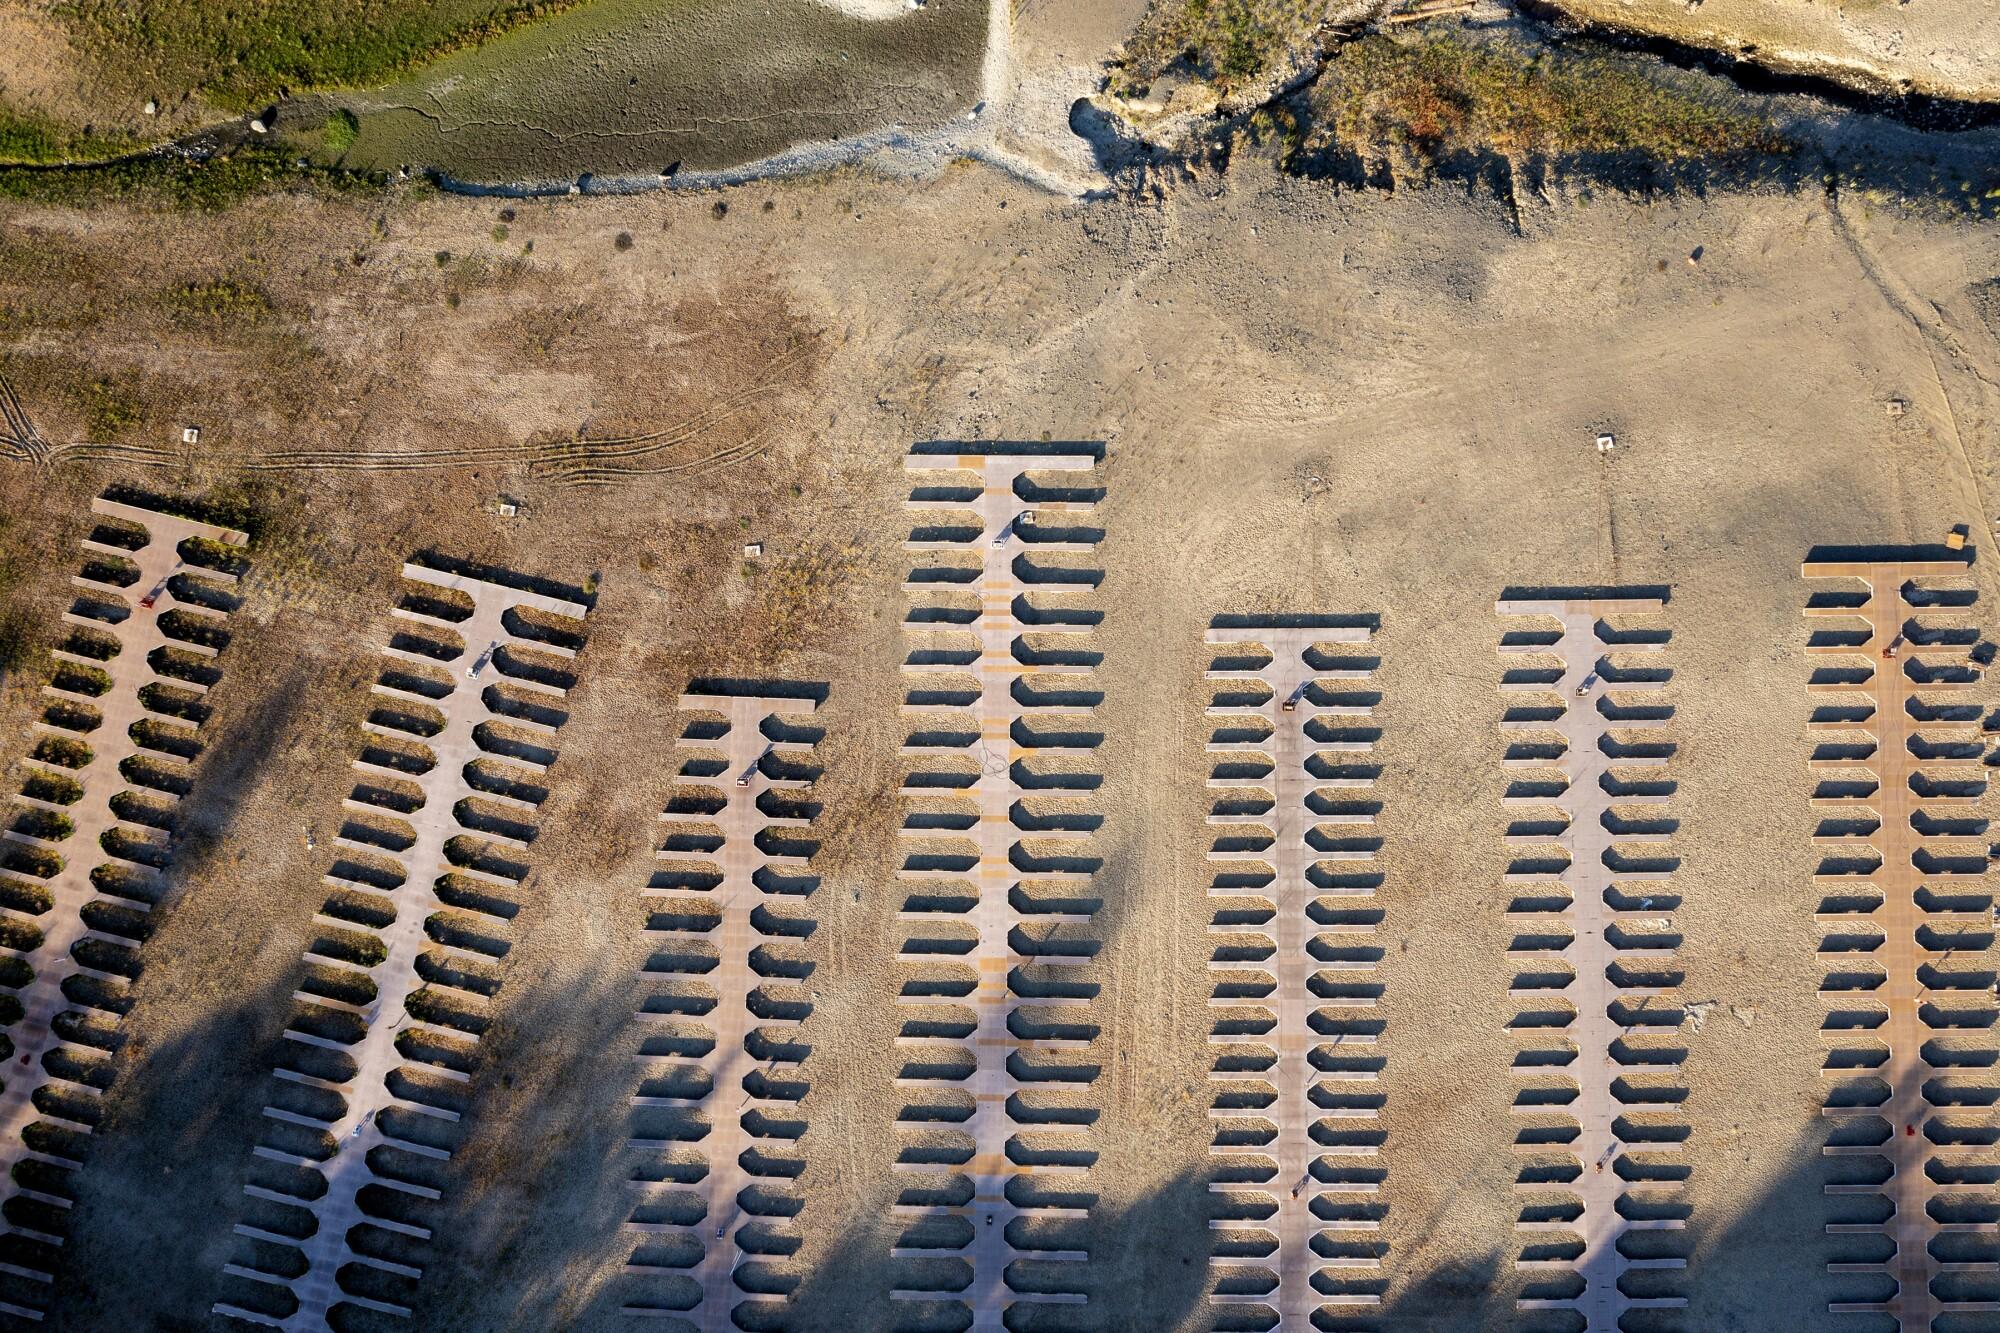 Boat slips lie stranded on dry land at drought-stricken Folsom Lake.